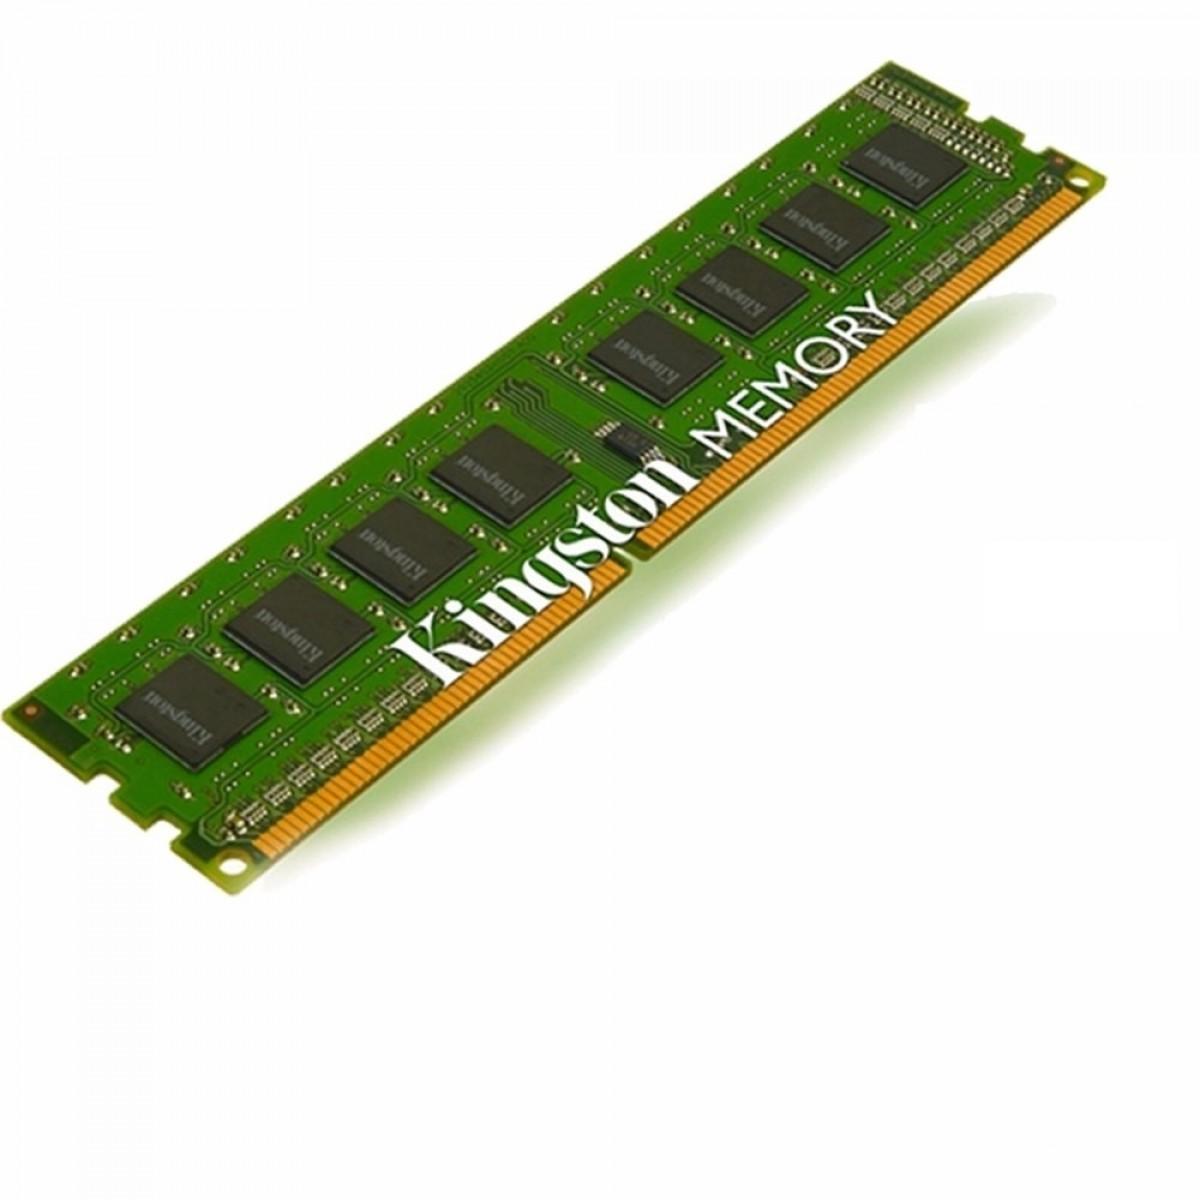 KINGSTON 4GB DDR-3 1600MHz Memory